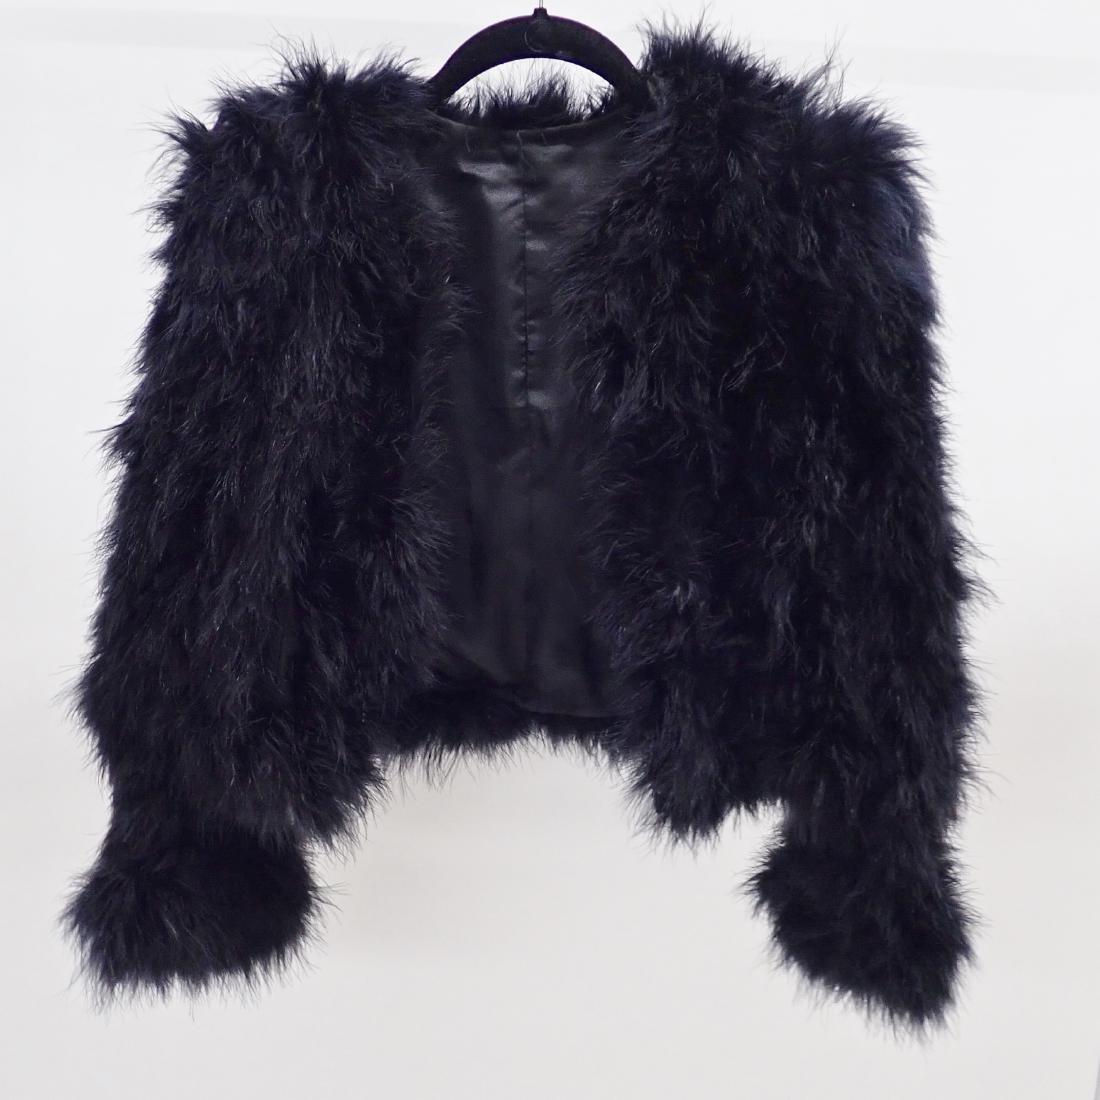 Vintage Black Ostrich Feather Jacket